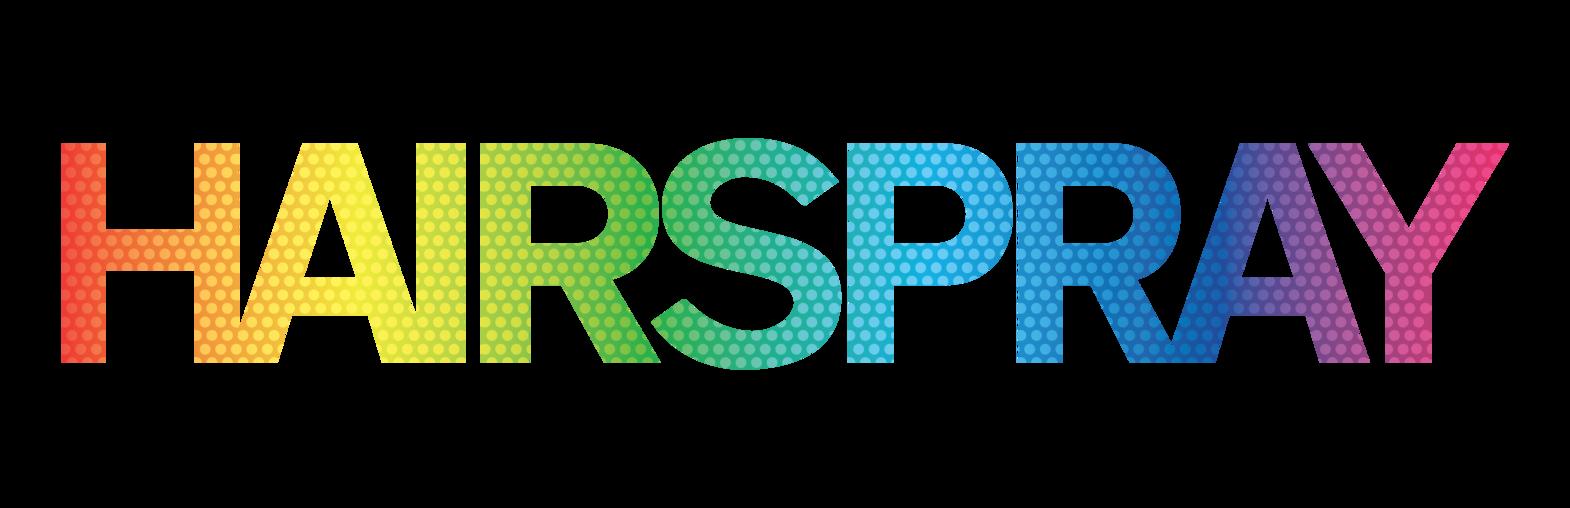 2019 year looks- Clutch Ultra hairspray logo